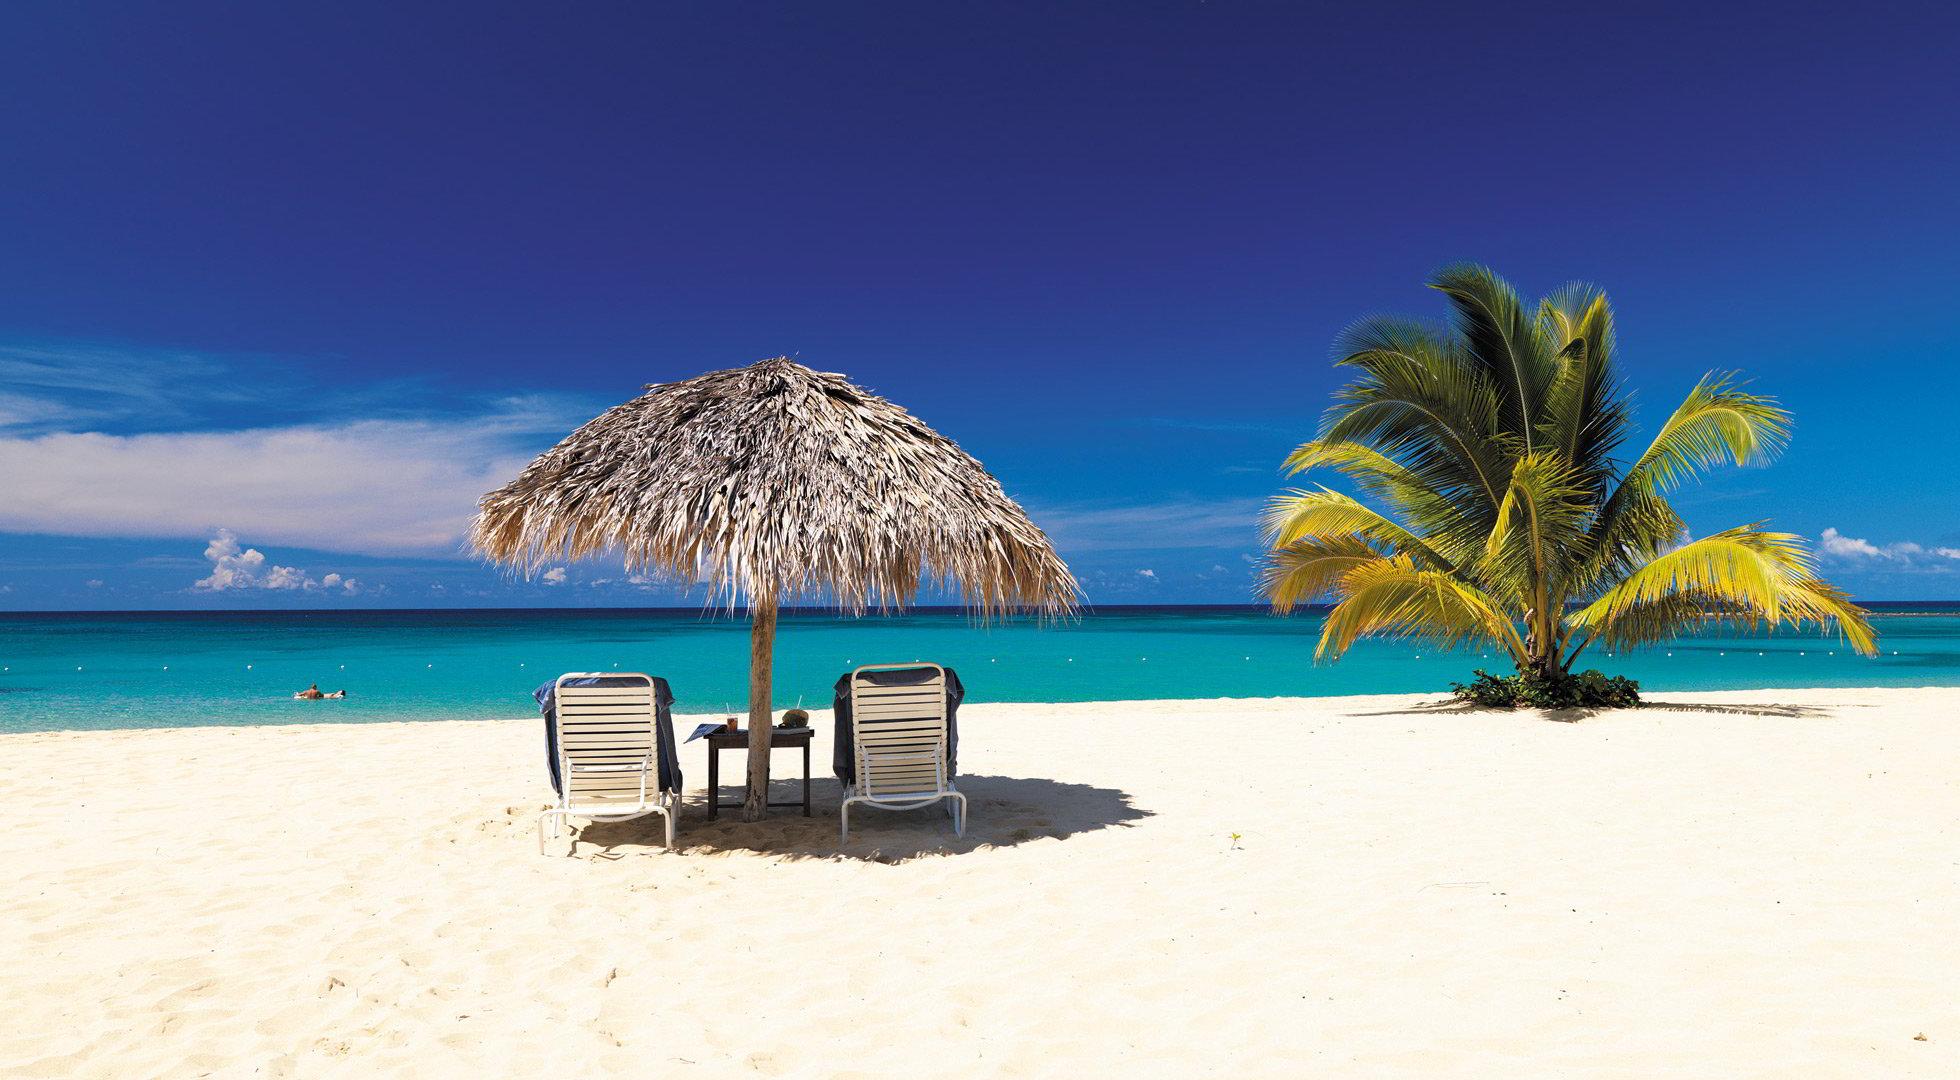 Beach Tour In Montego Bay Travel Jamaica Tours